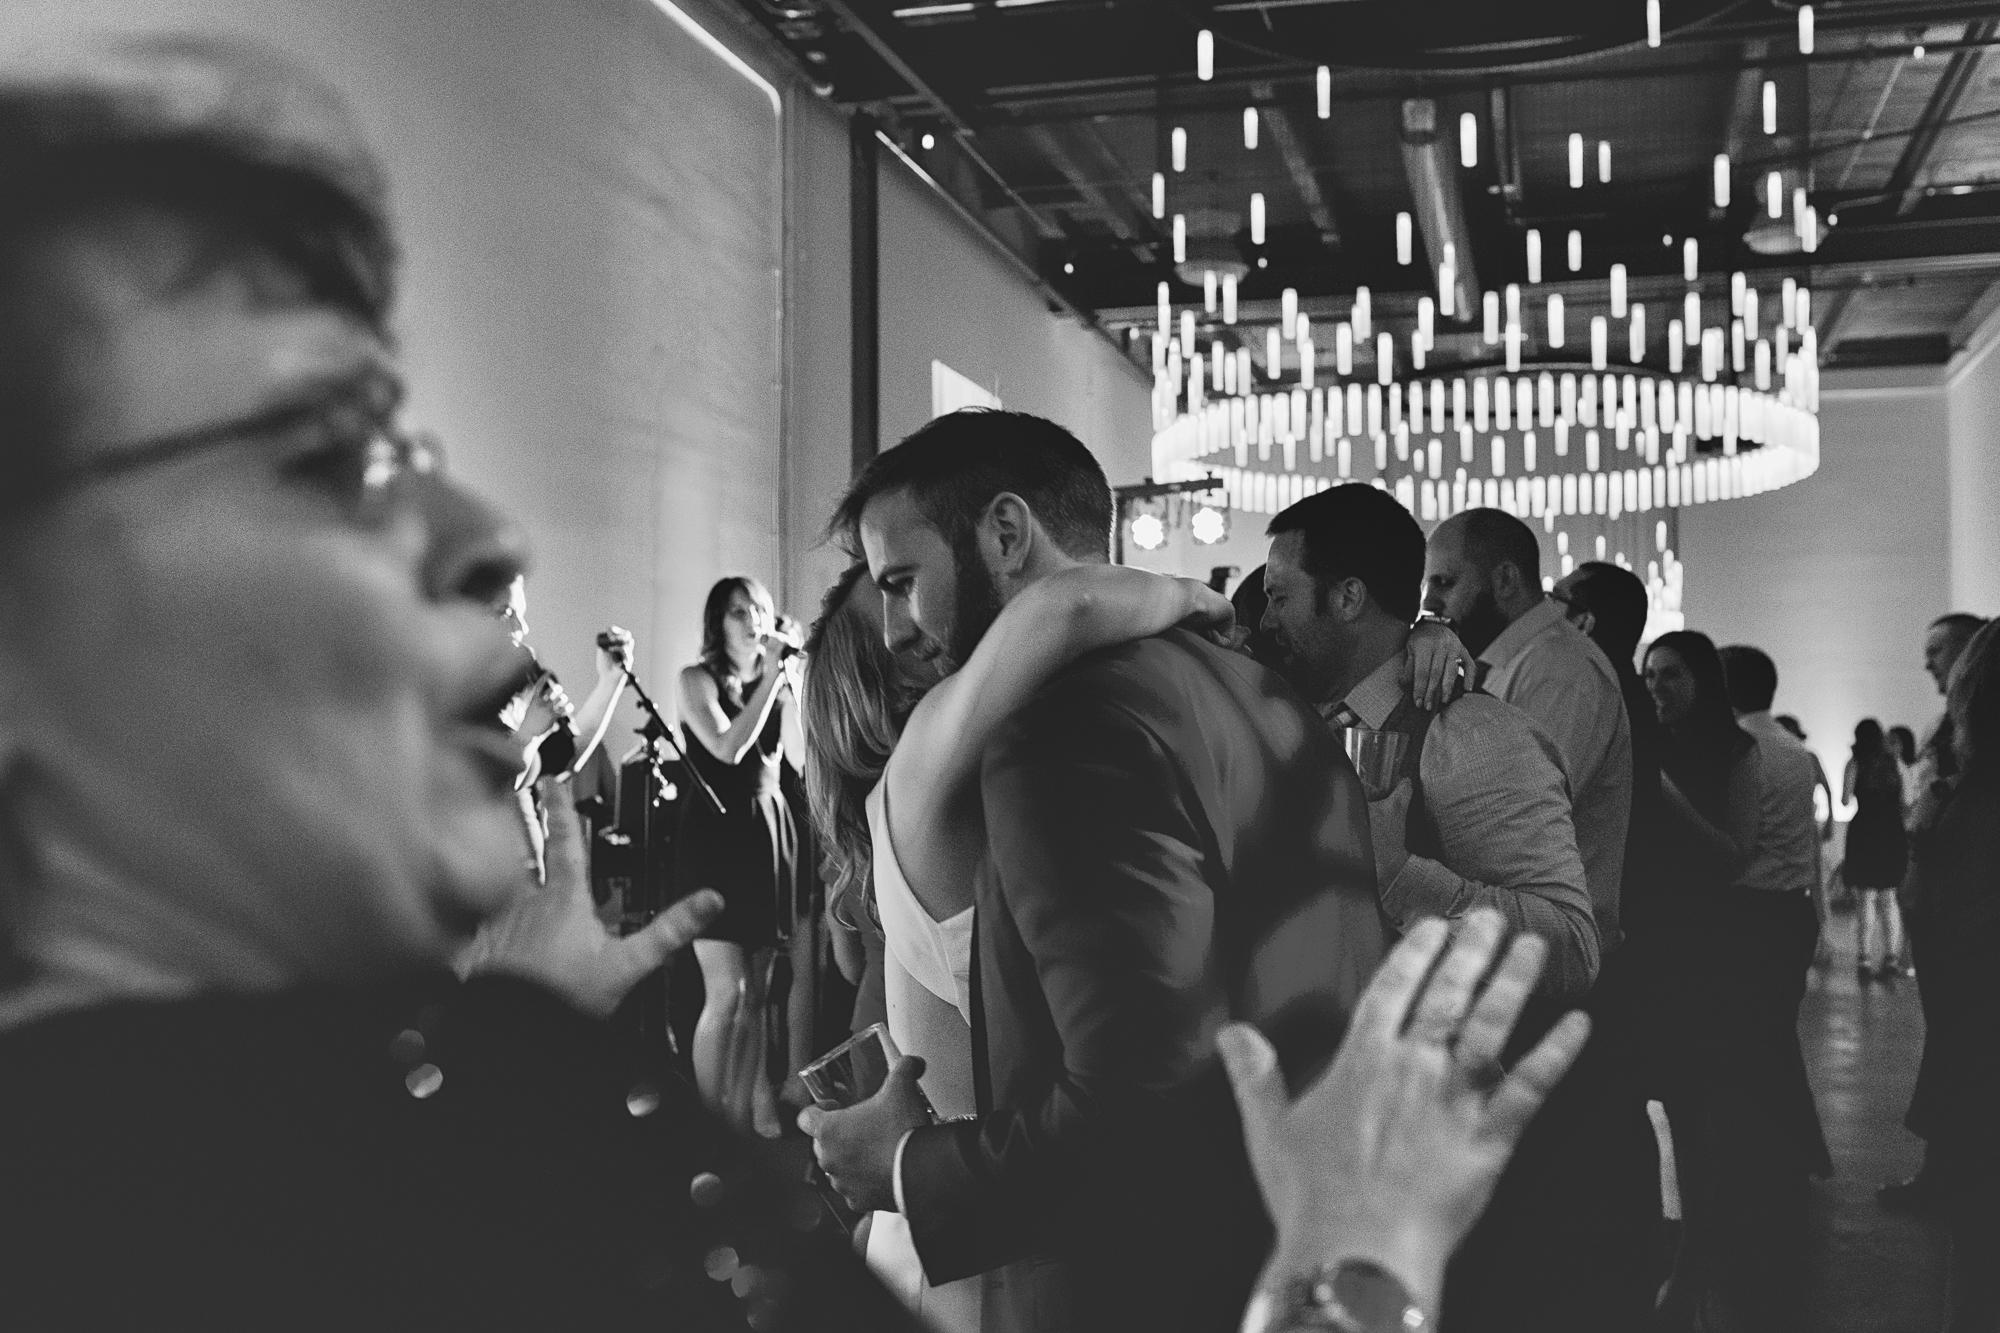 canvas event space wedding photos by Krista Welch-0157.jpg